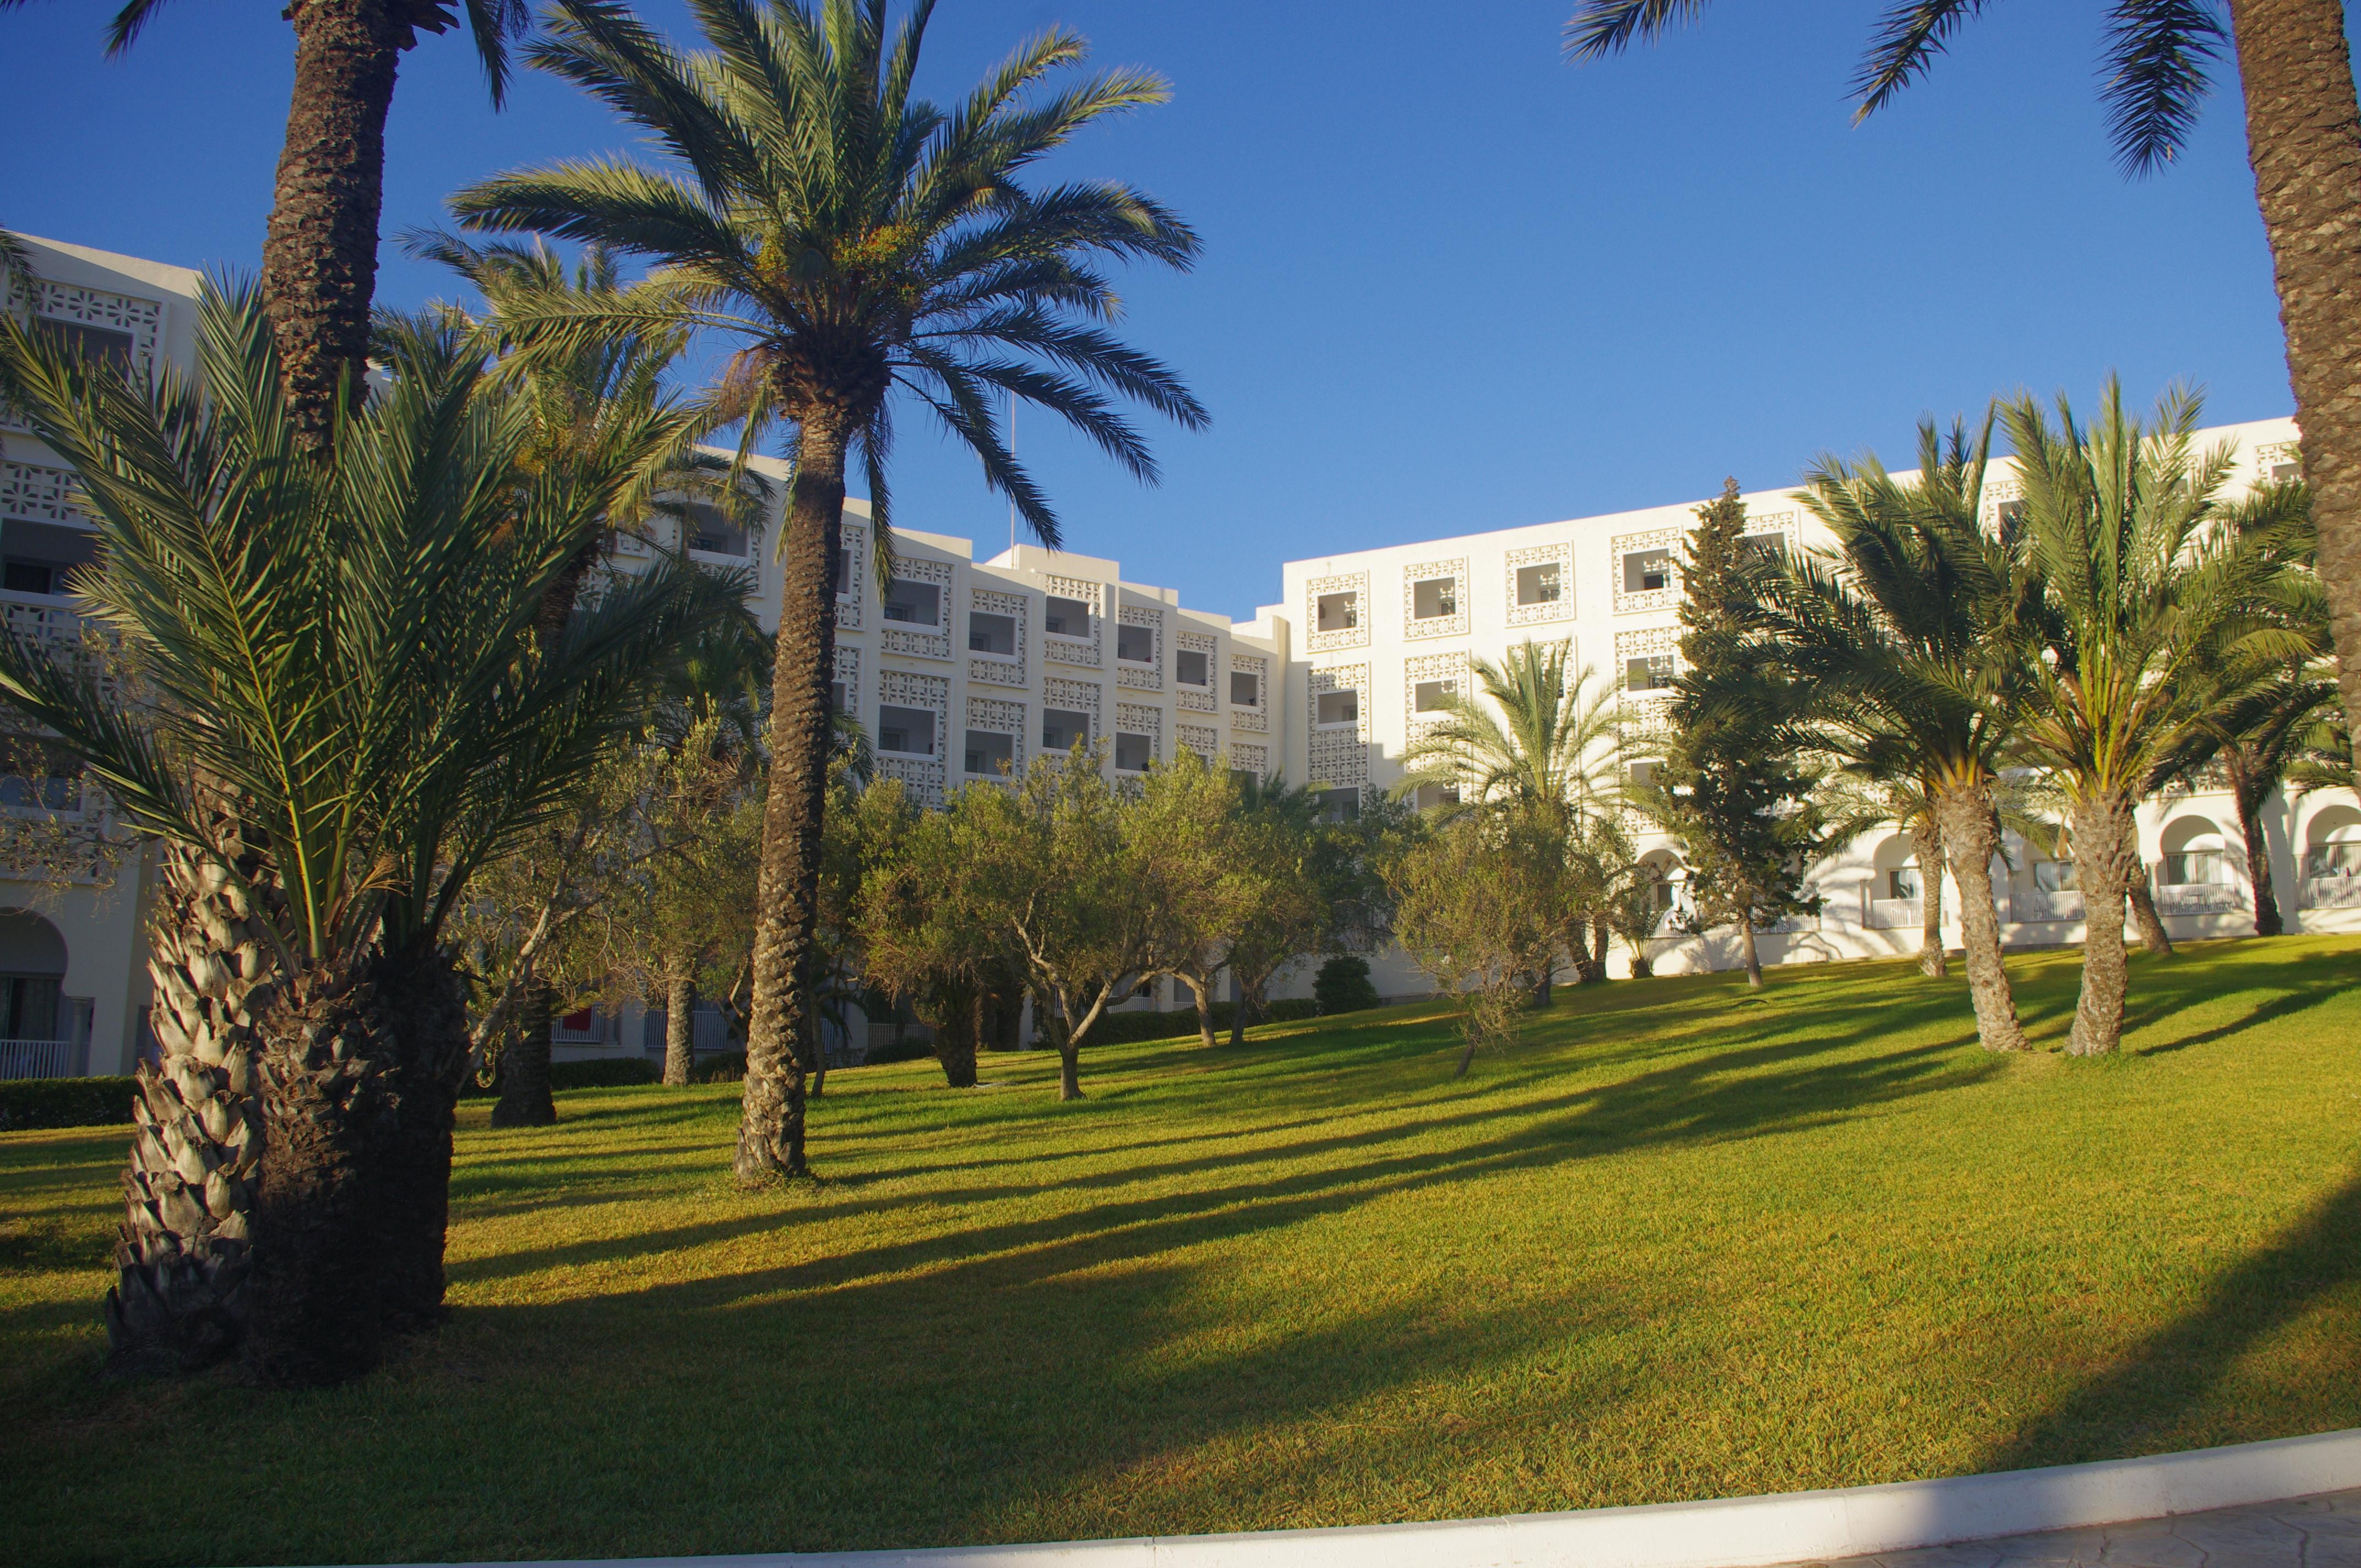 Pohled na Marhaba resort ze zahrady